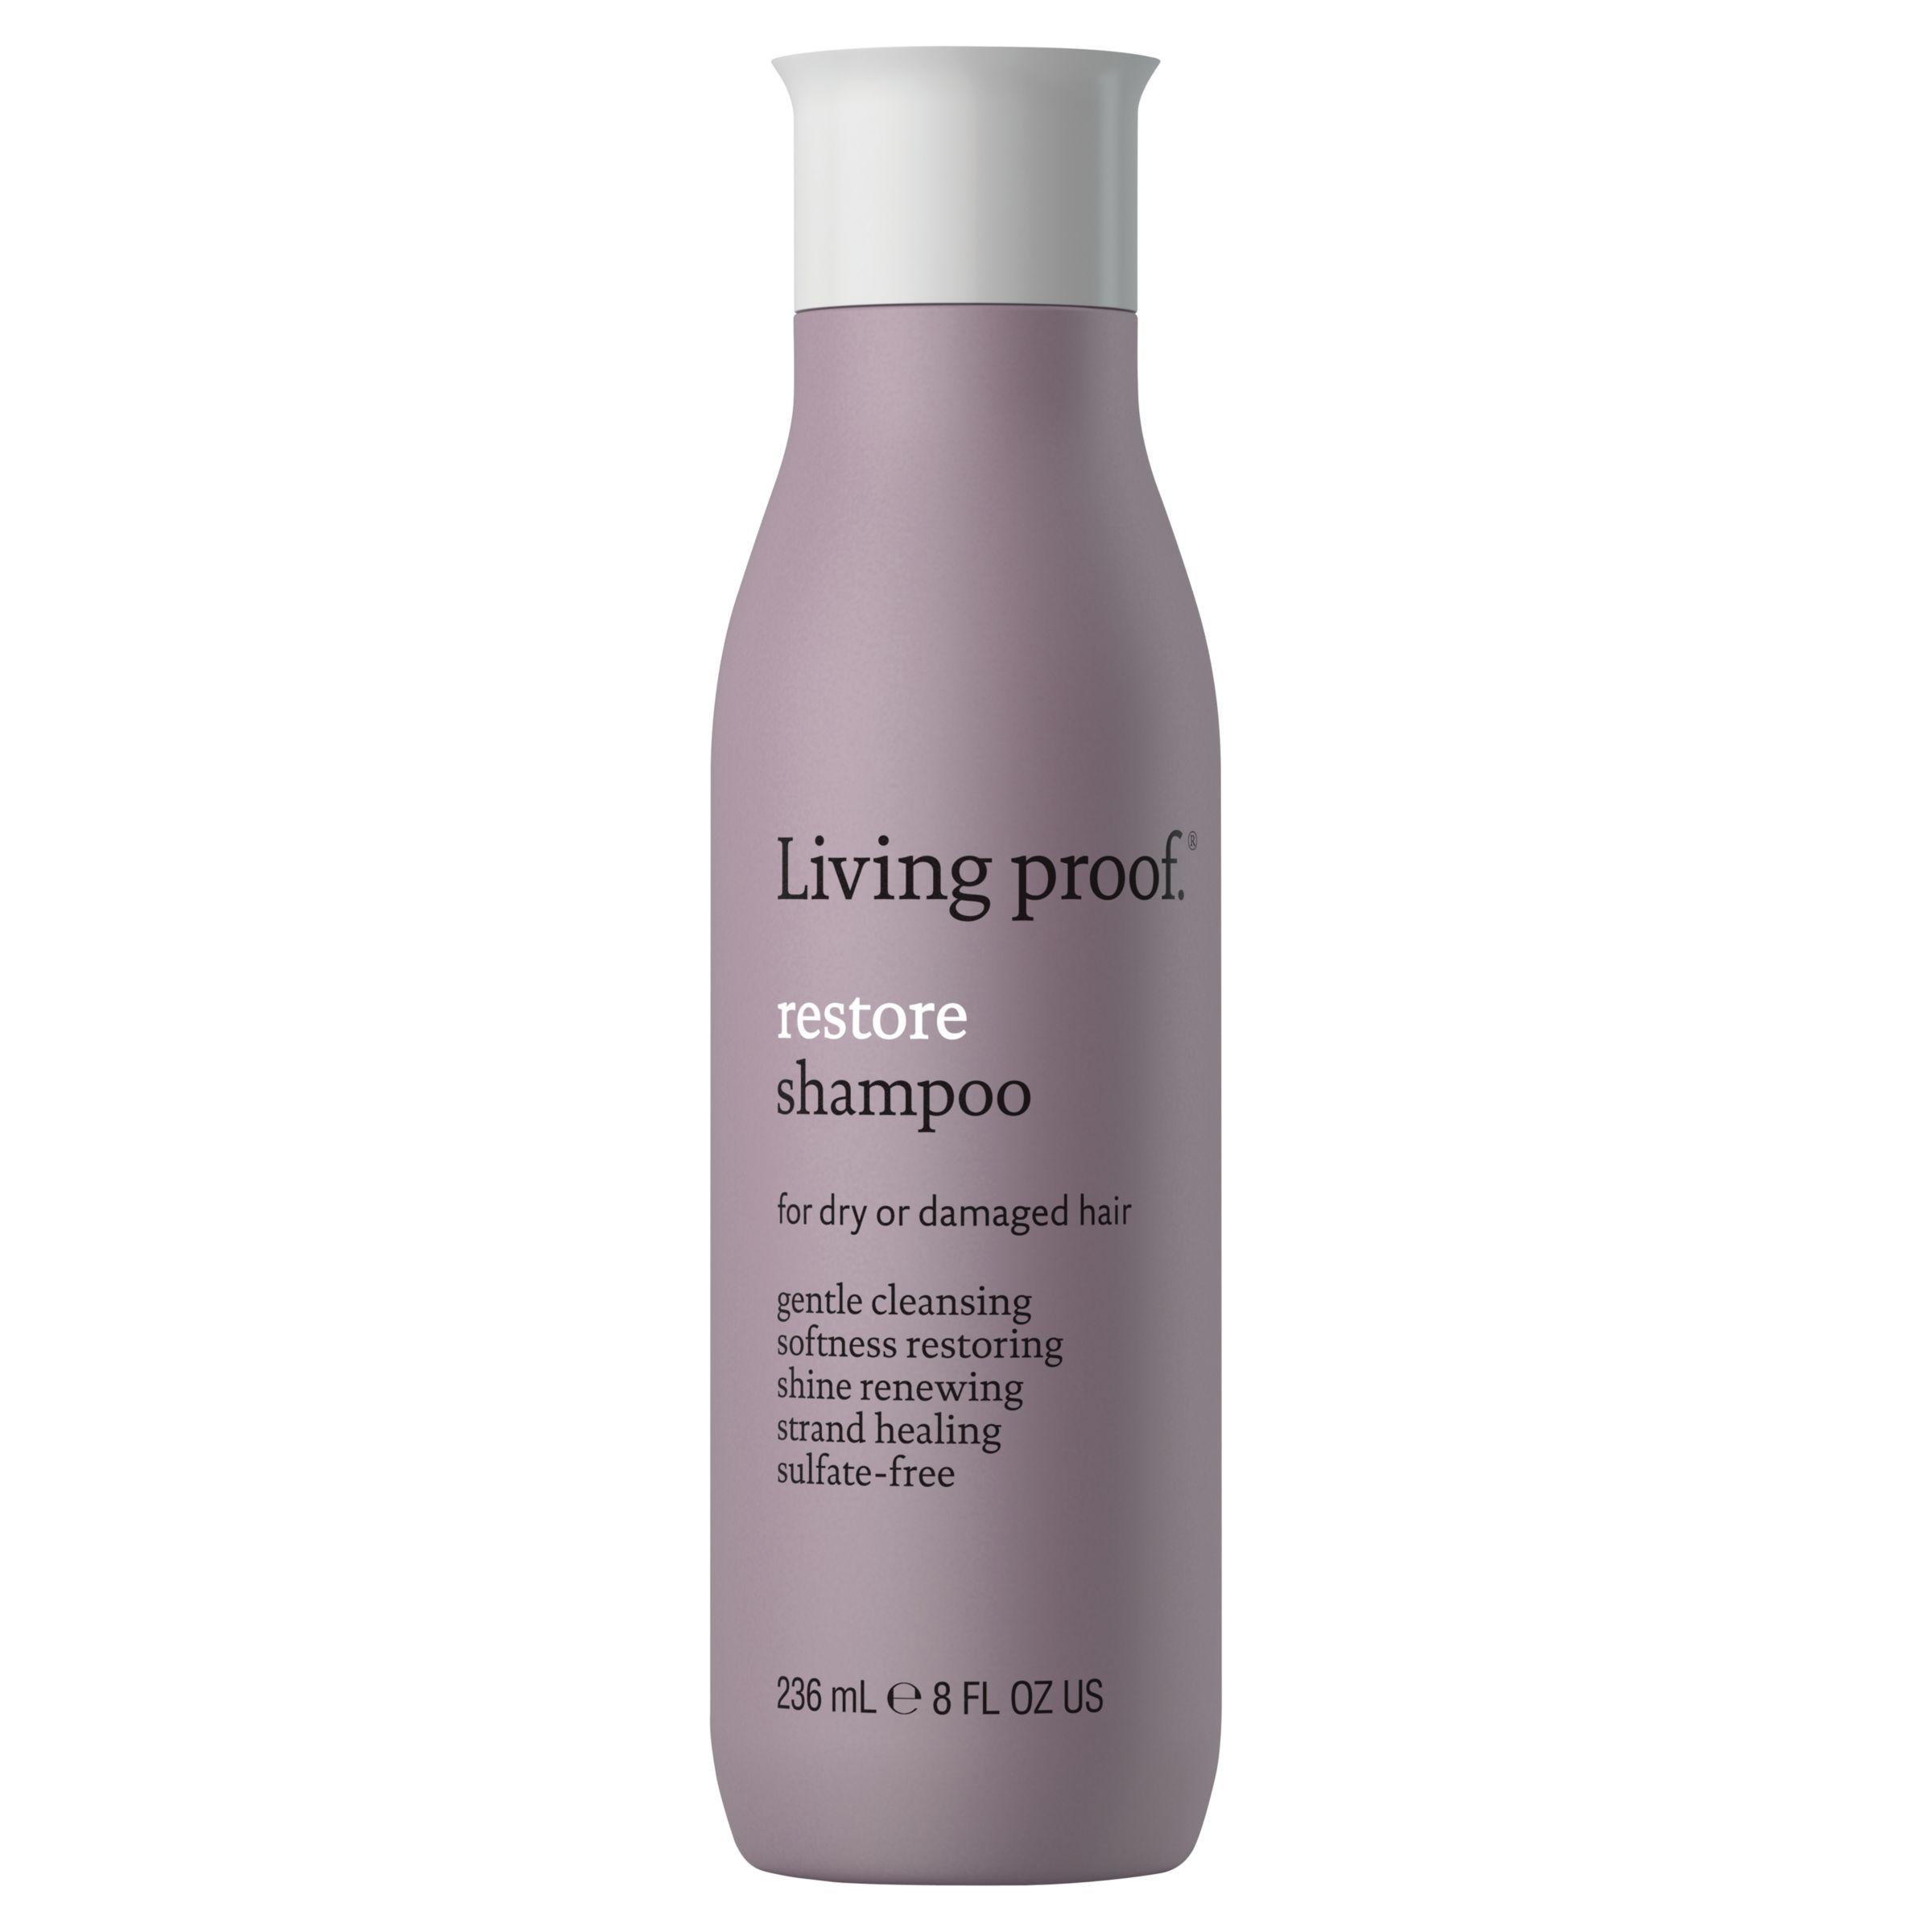 Living Proof Living Proof Restore Shampoo, 236ml